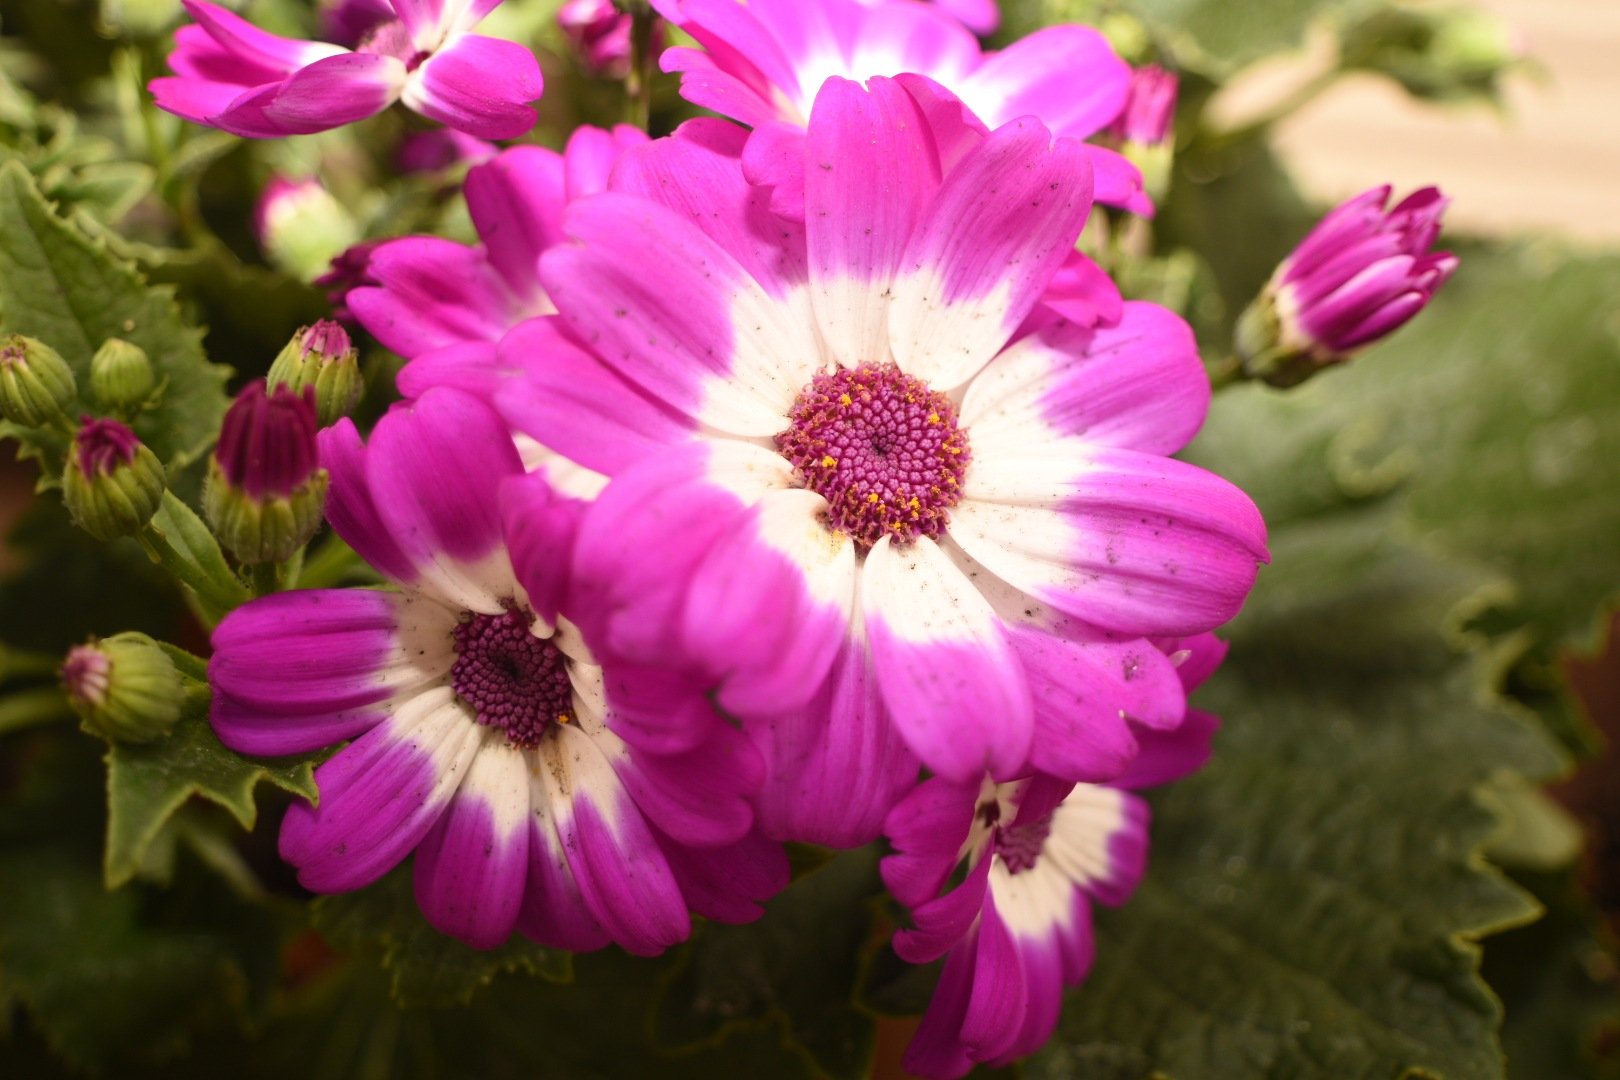 Flower by Toshio Sunada